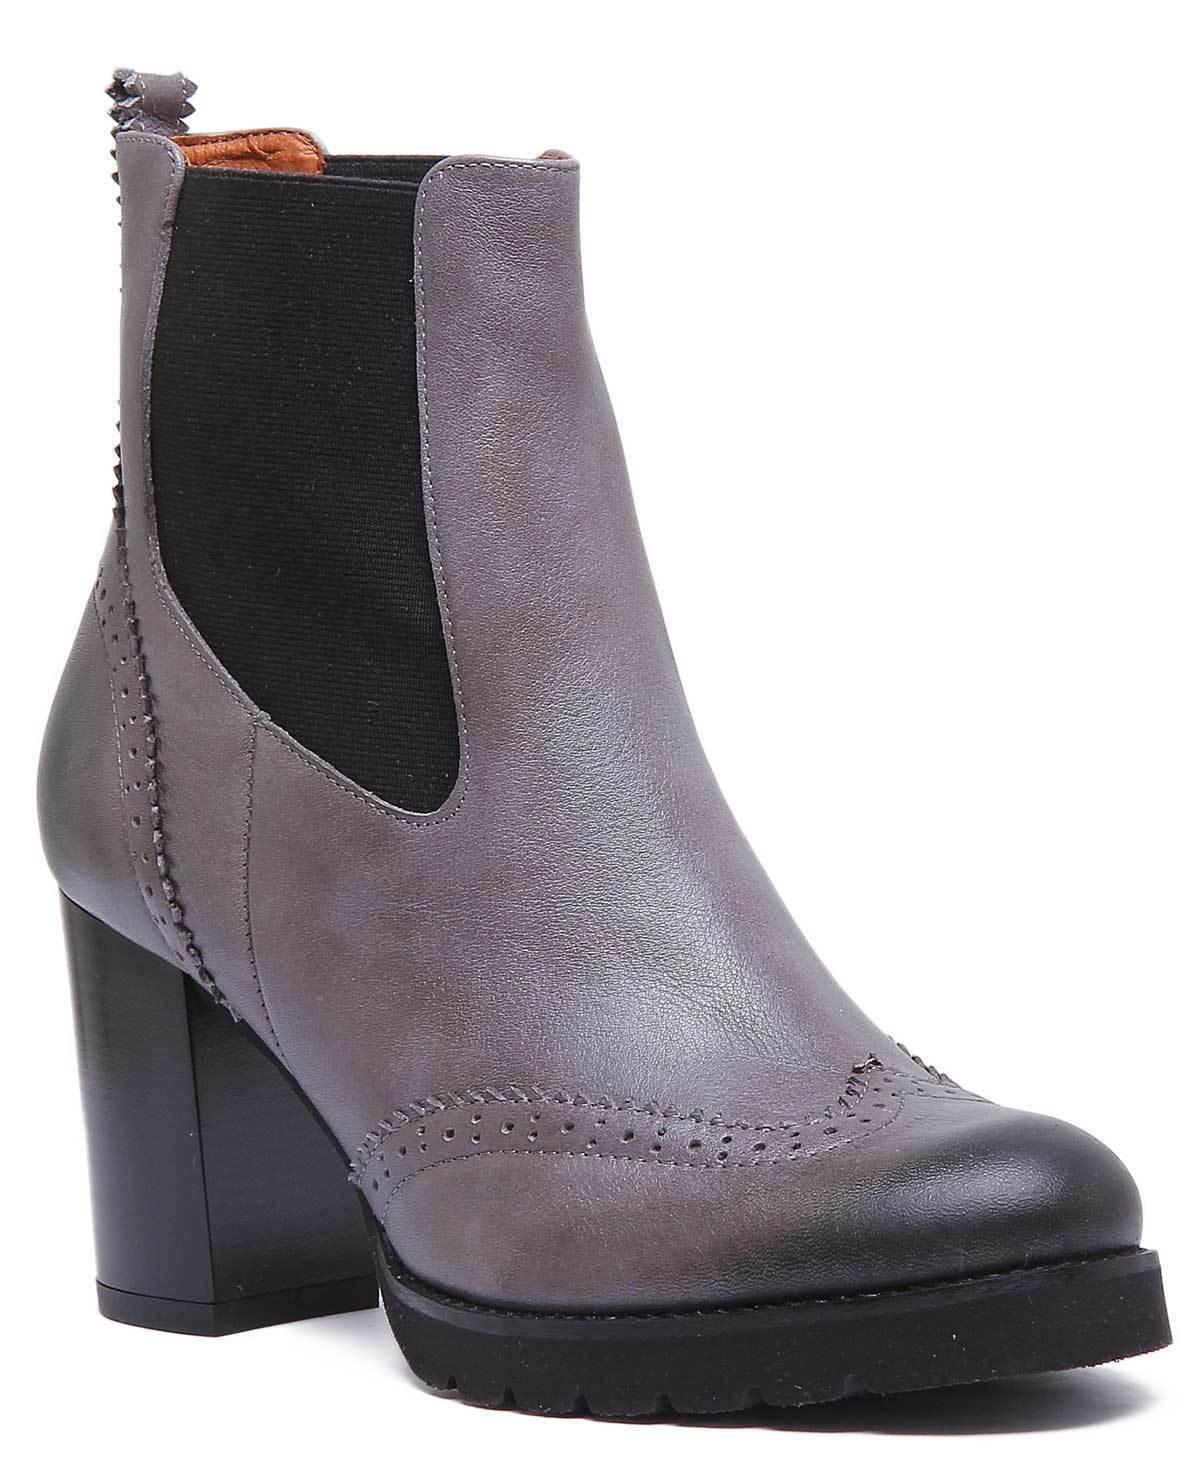 Justin Reece Alice Damens Leder Grau Heeled Ankle Stiefel